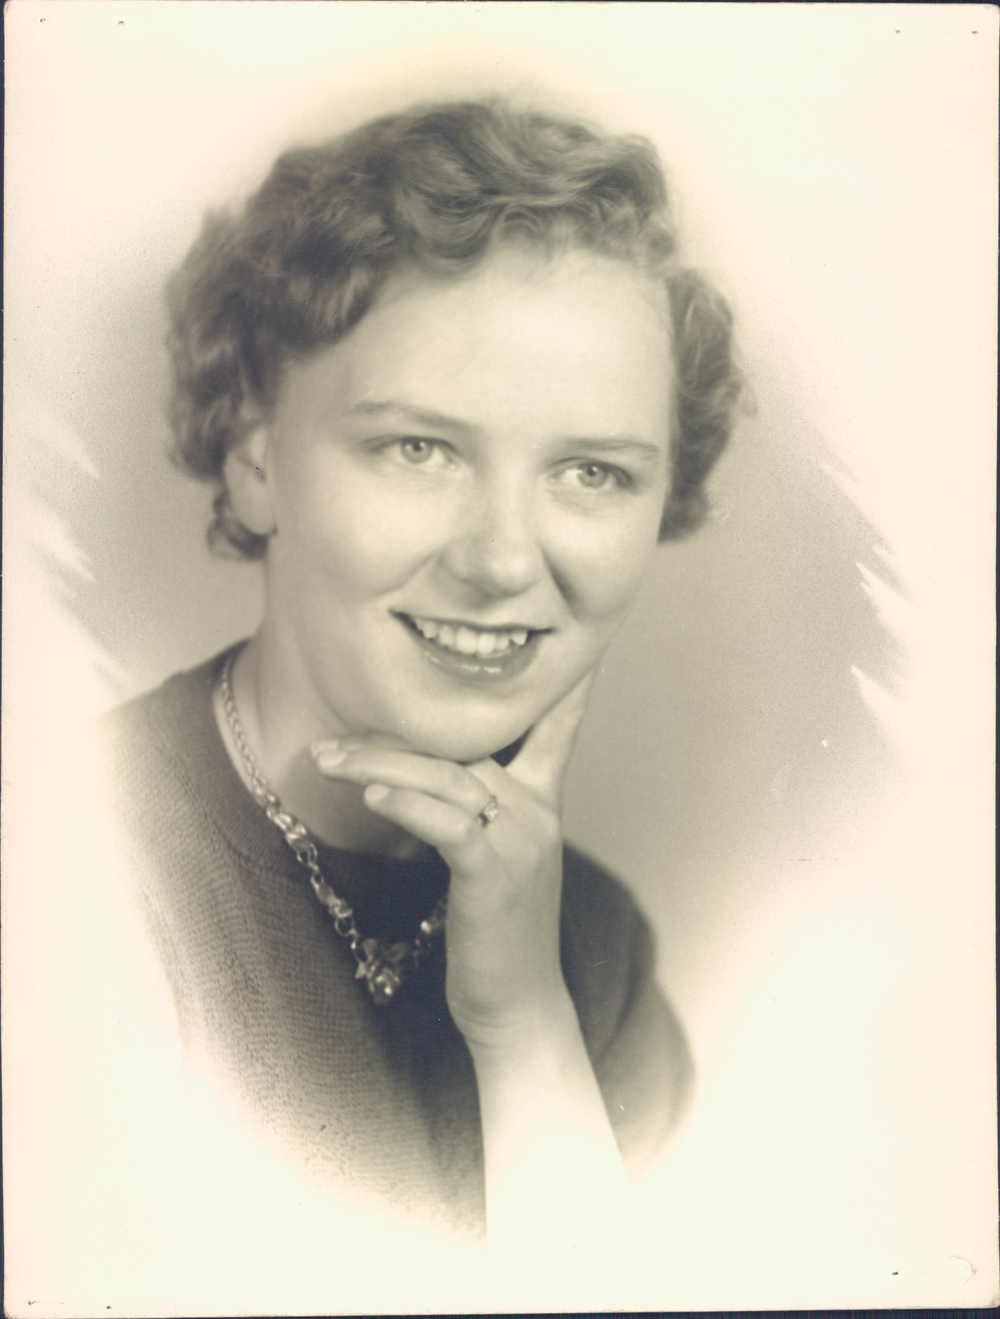 1951 Nellie 17 years old.jpg